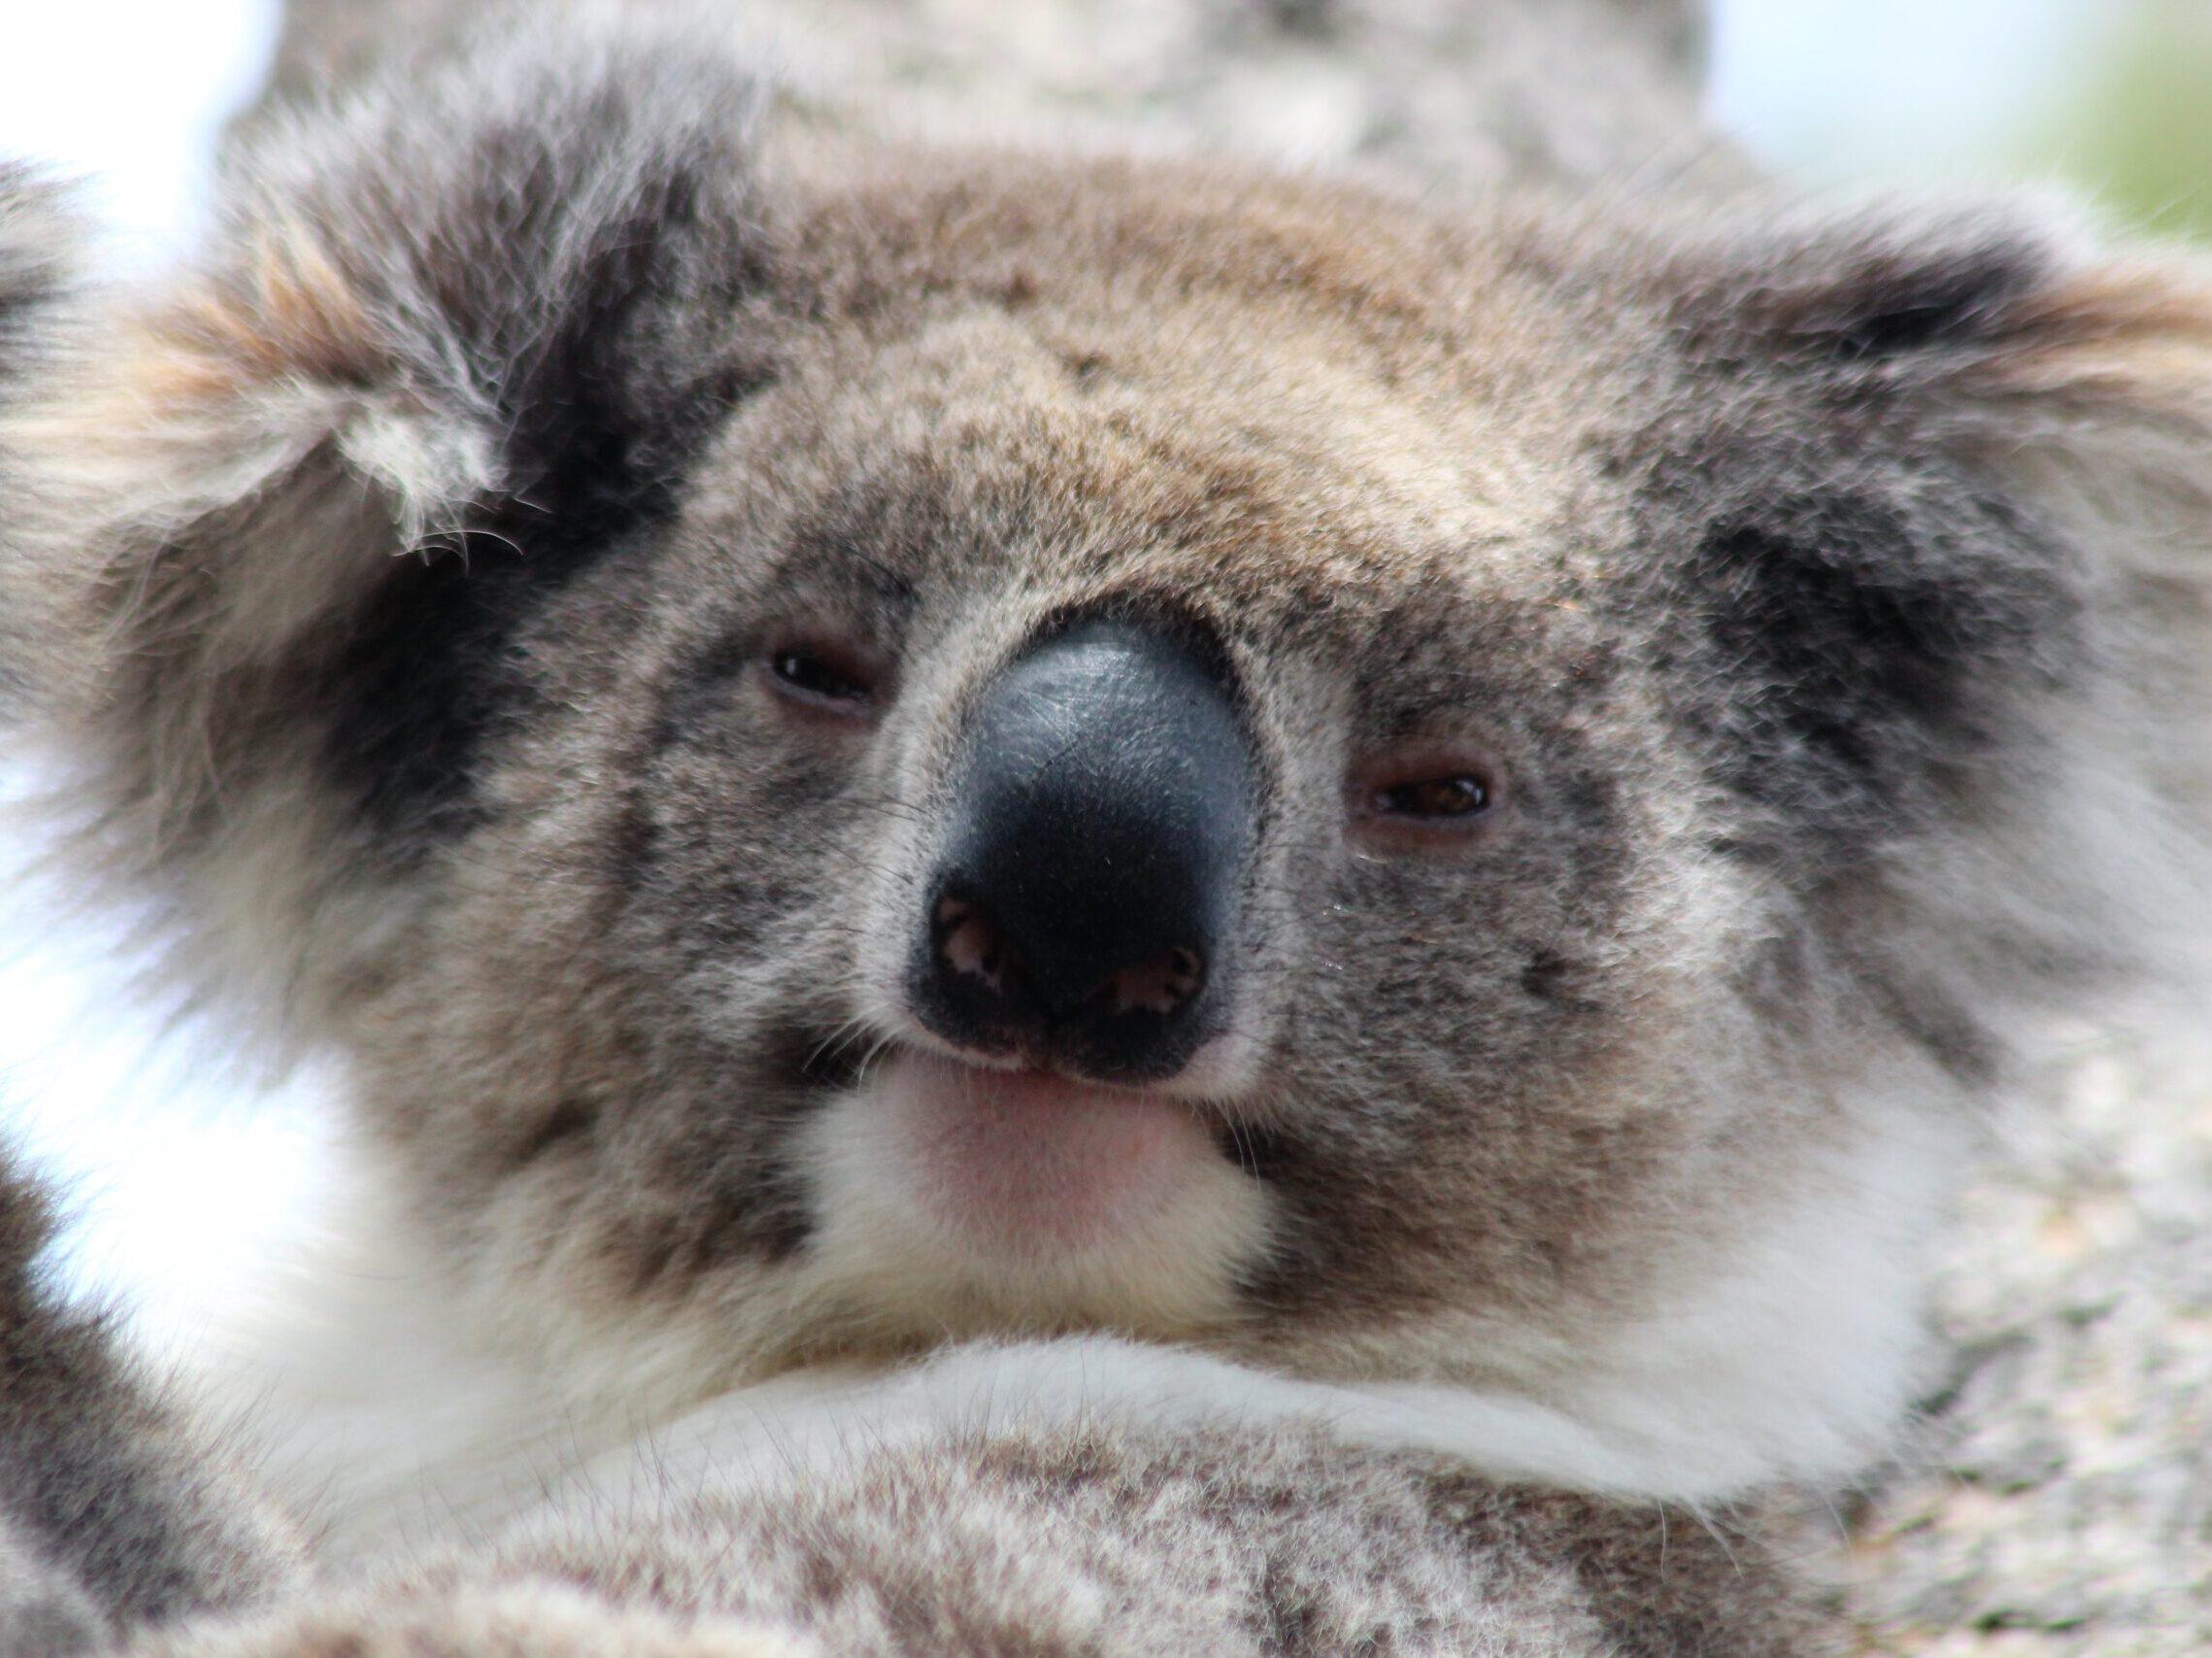 Australian Koala, Kangaroo Island